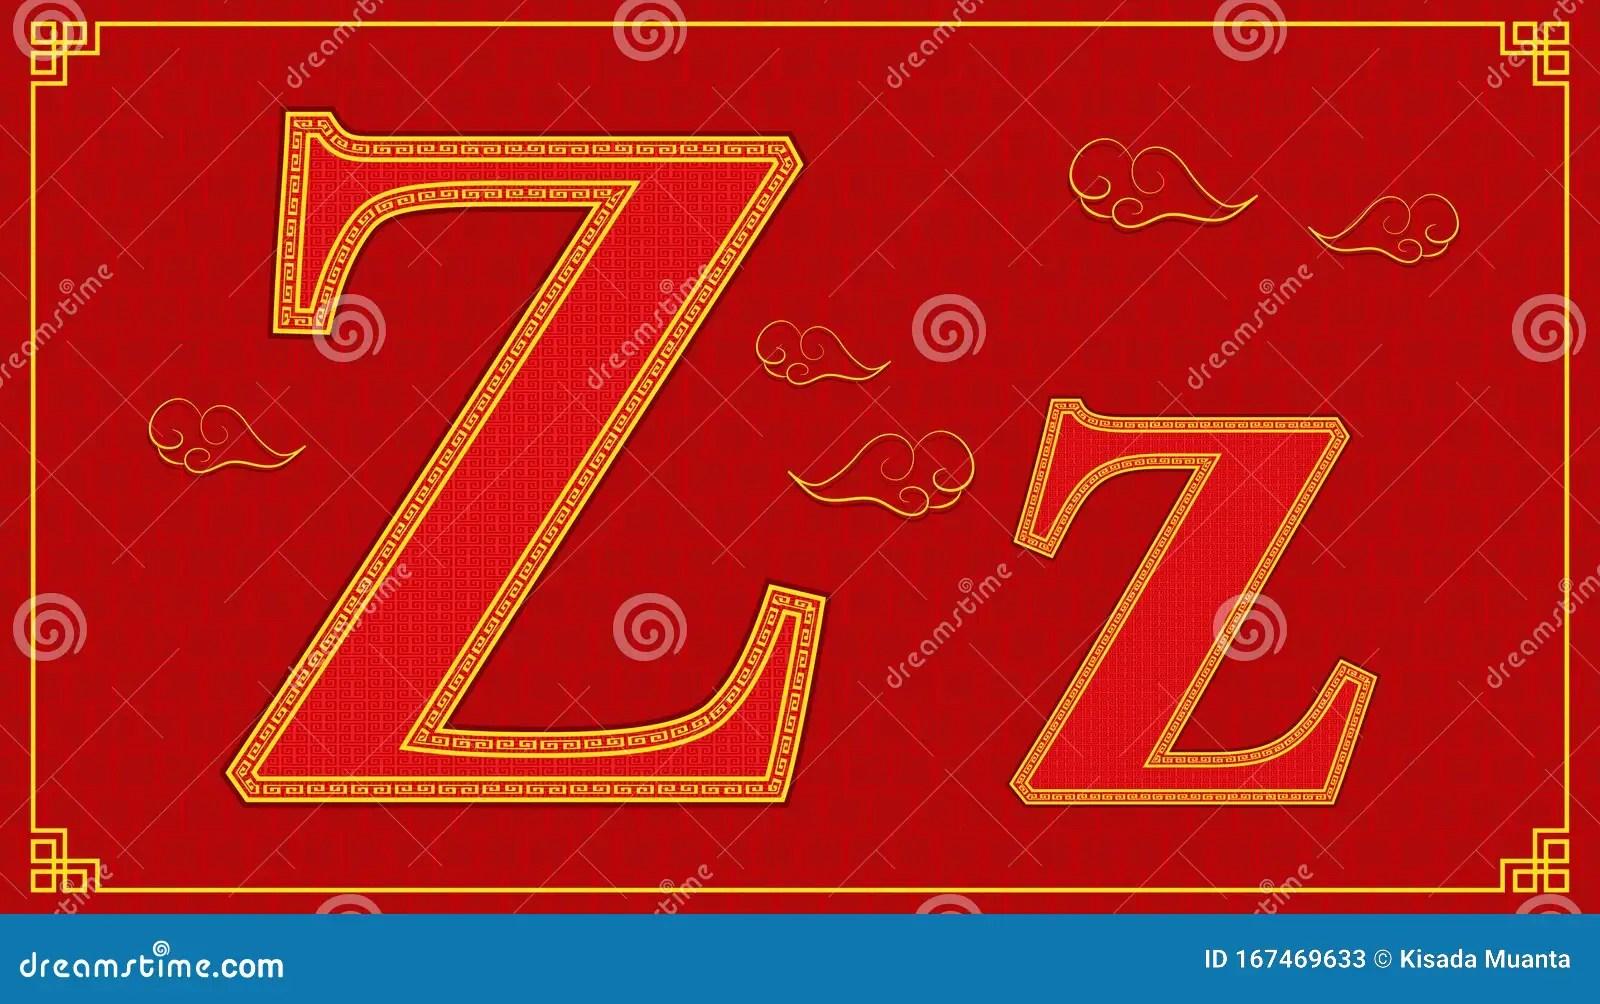 Z Lucky Alphabet Character Consonant Happy Chinese New